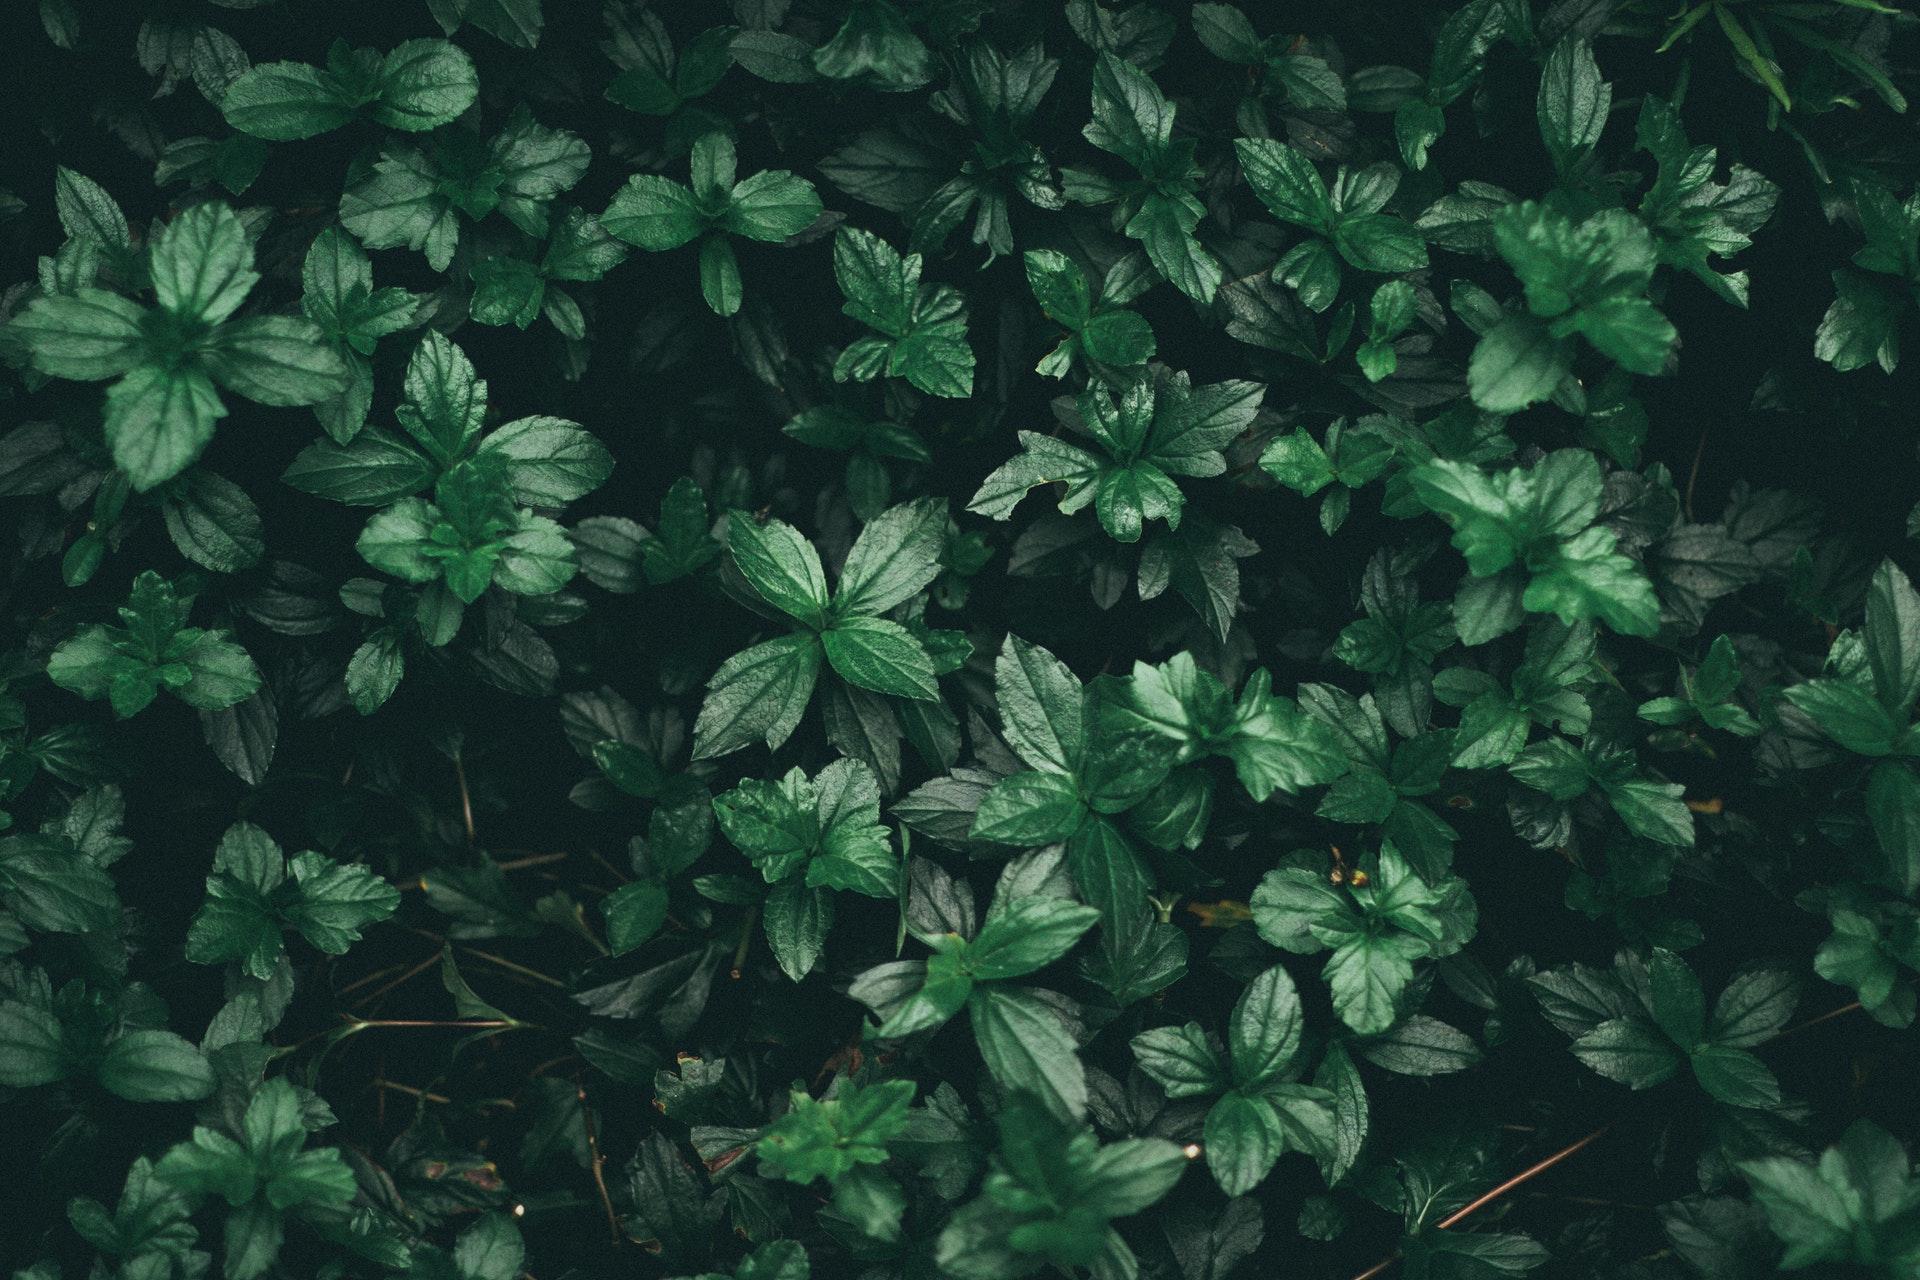 pexels-photo-808510.jpeg